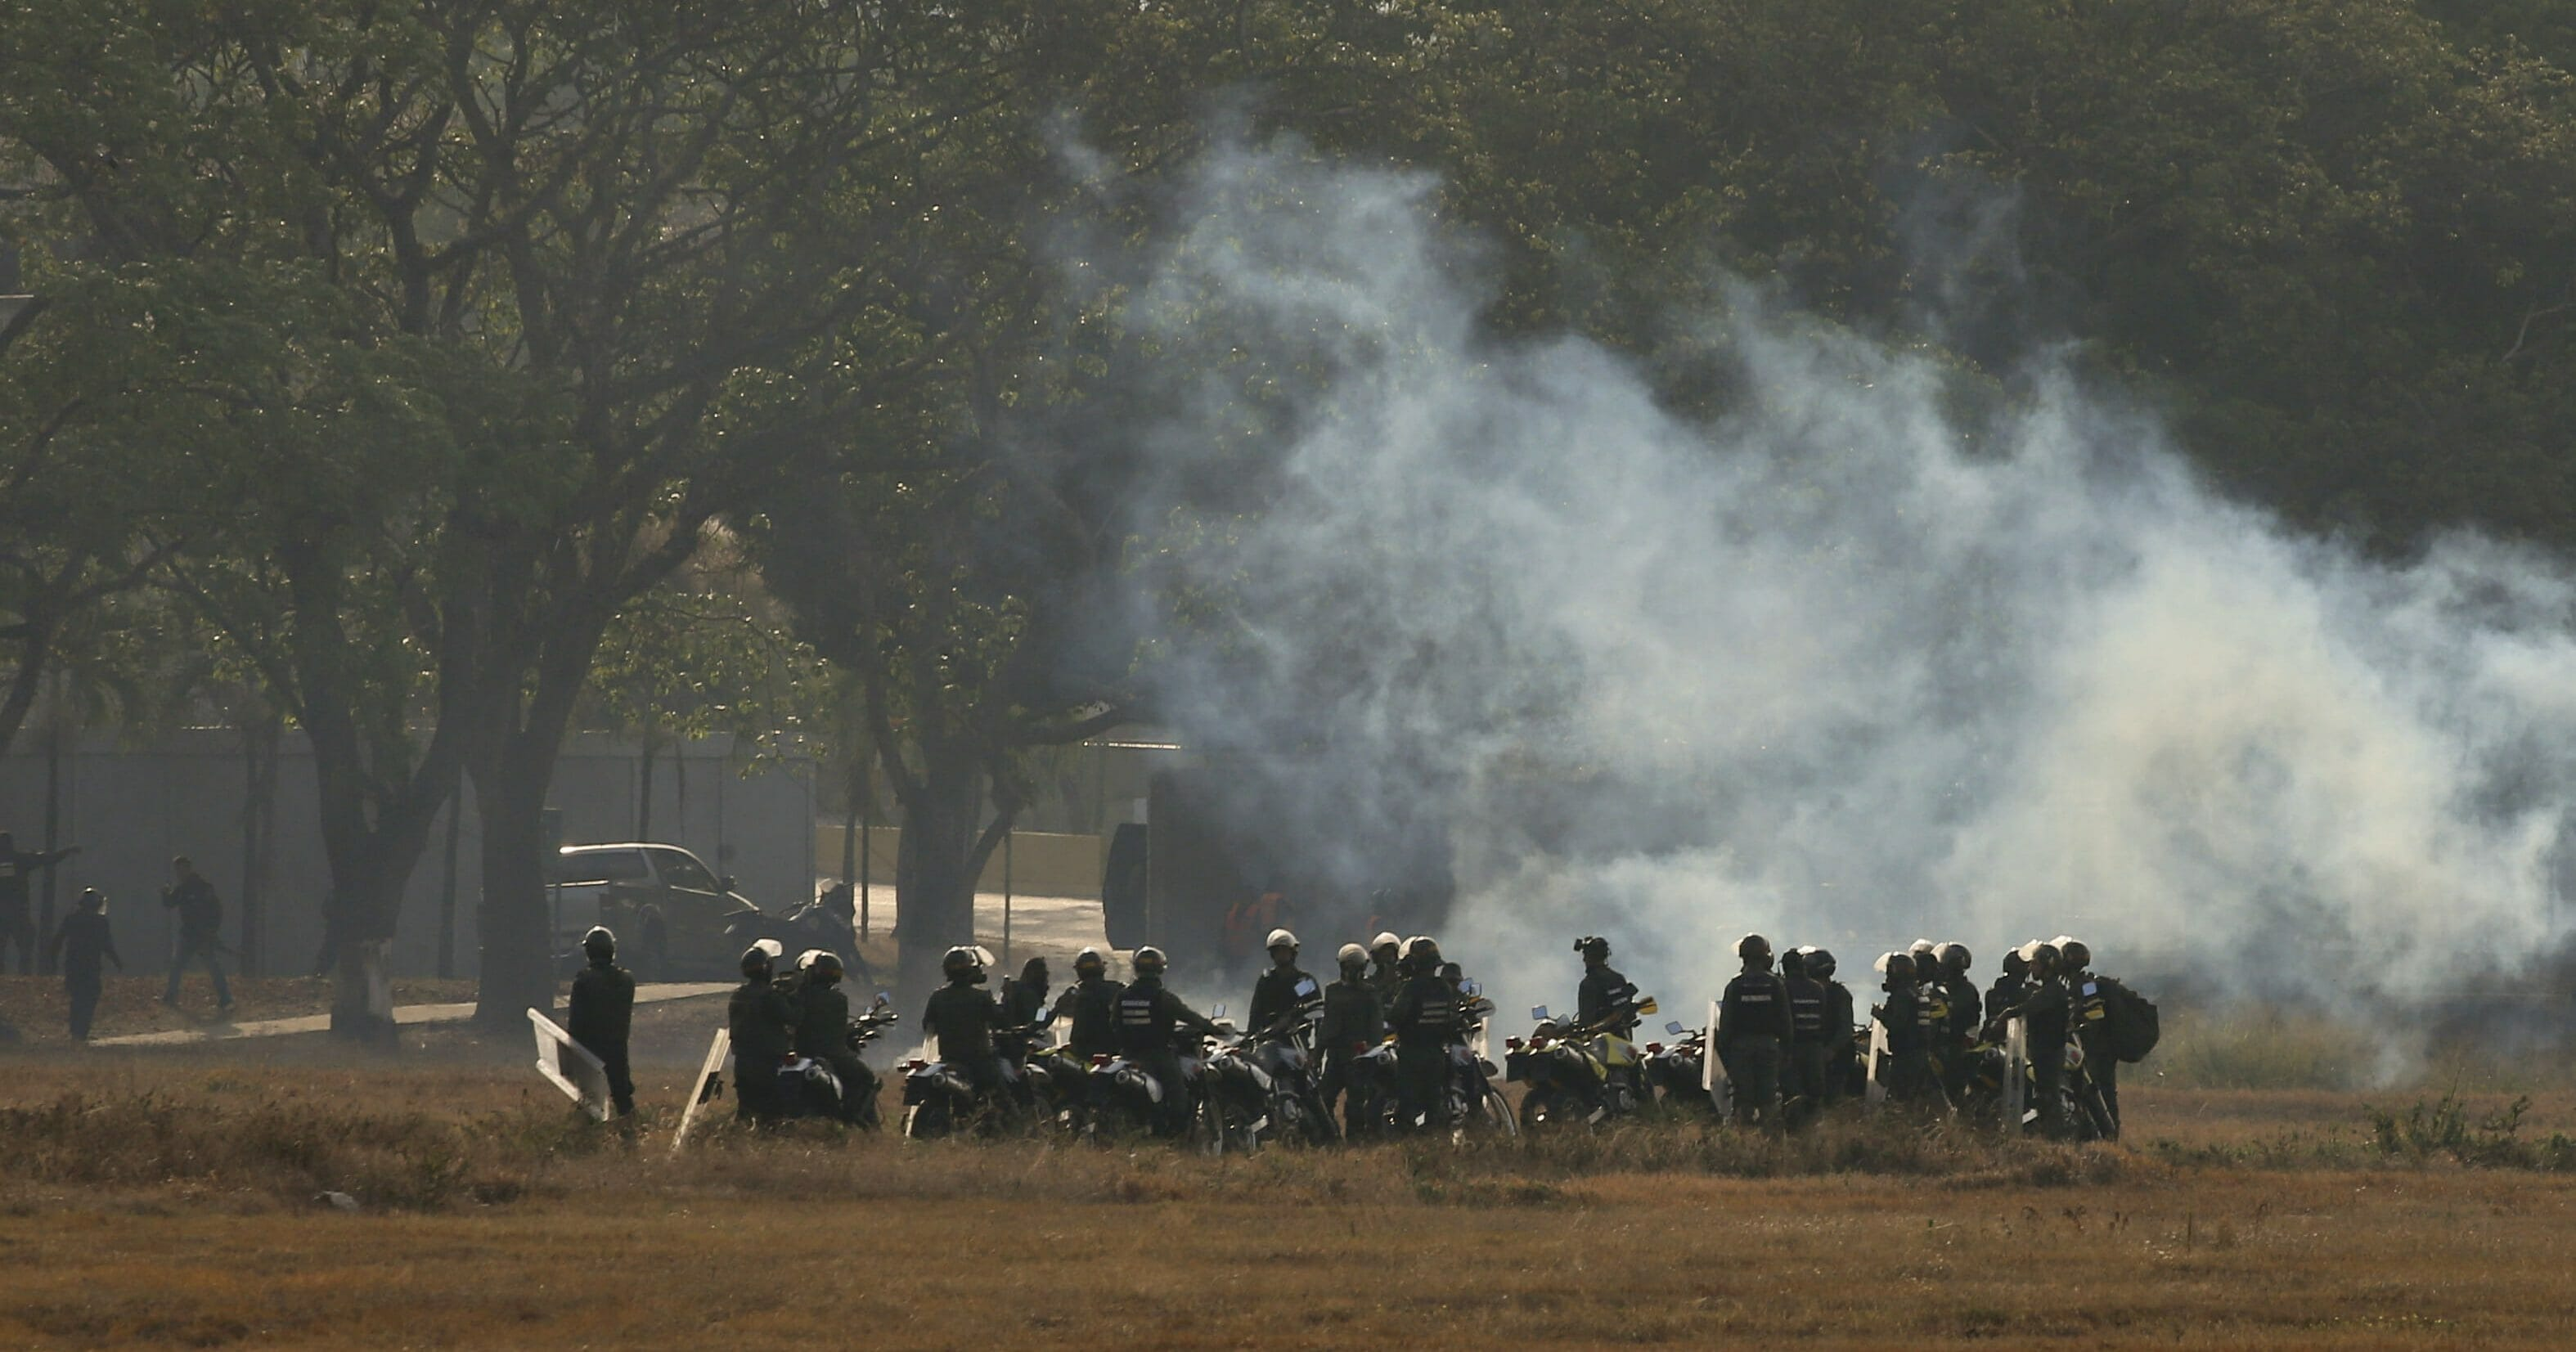 Troops loyal to Venezuelan President Nicolas Maduro stand amid tear gas they fired from inside La Carlota airbase.